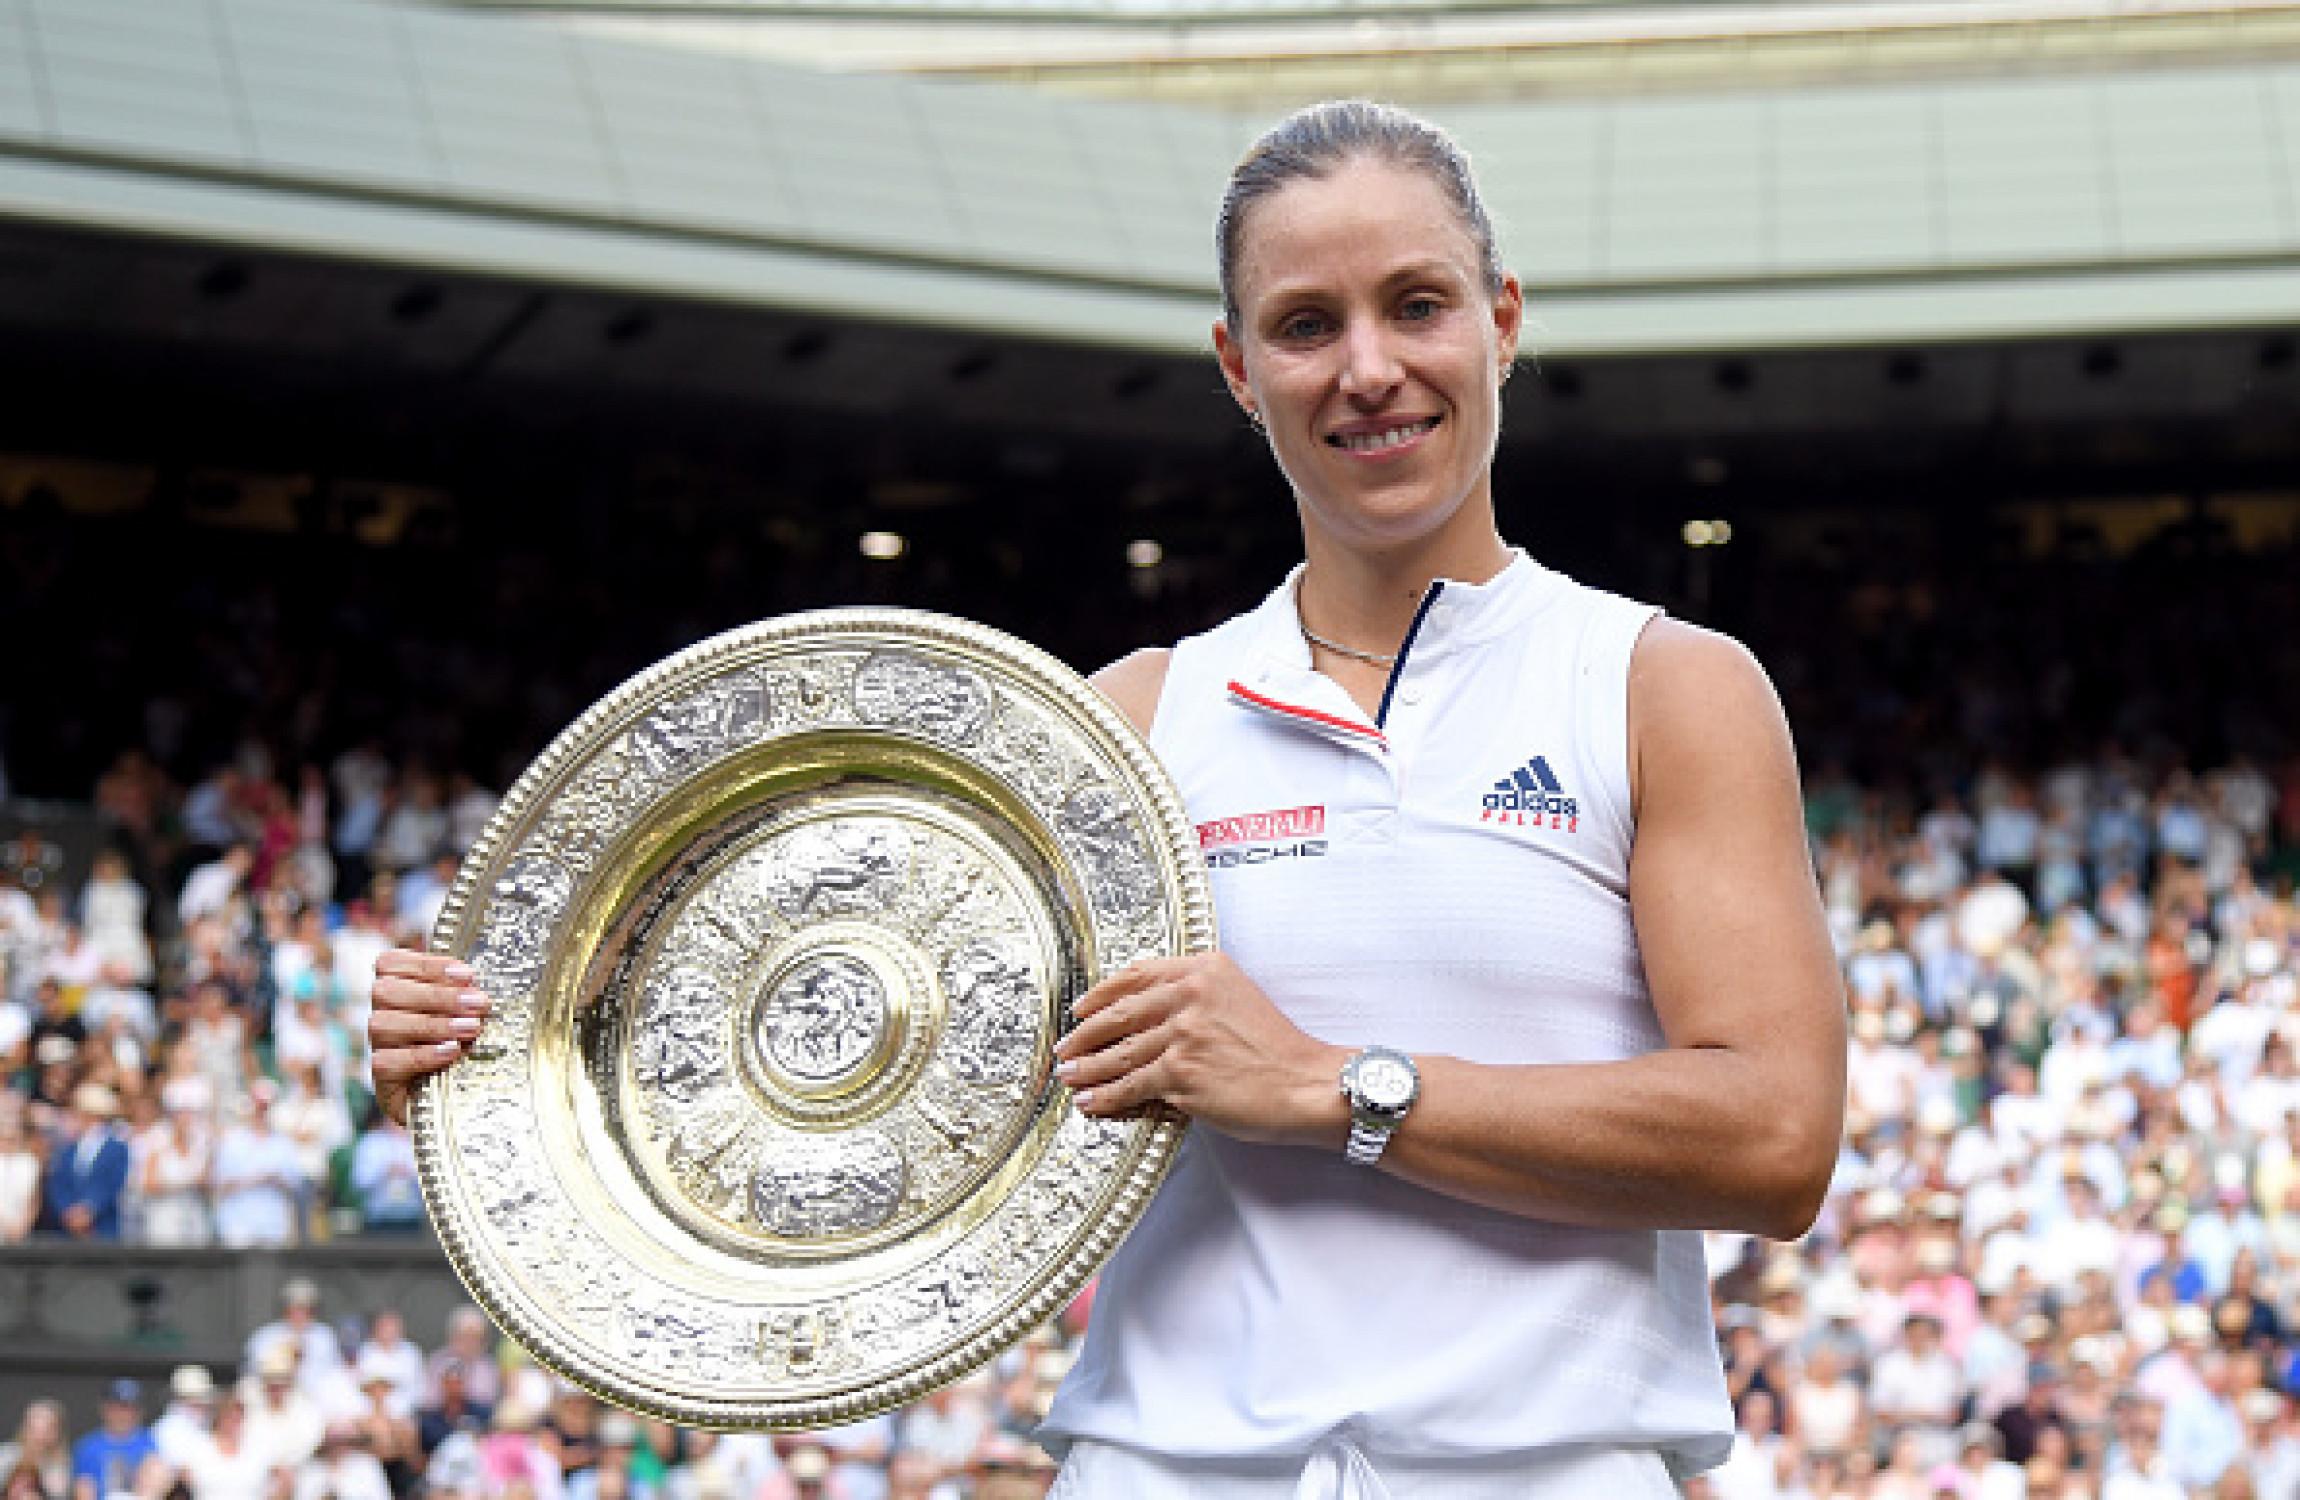 Watch Angelique Kerber 3 Grand Slam singles titles video